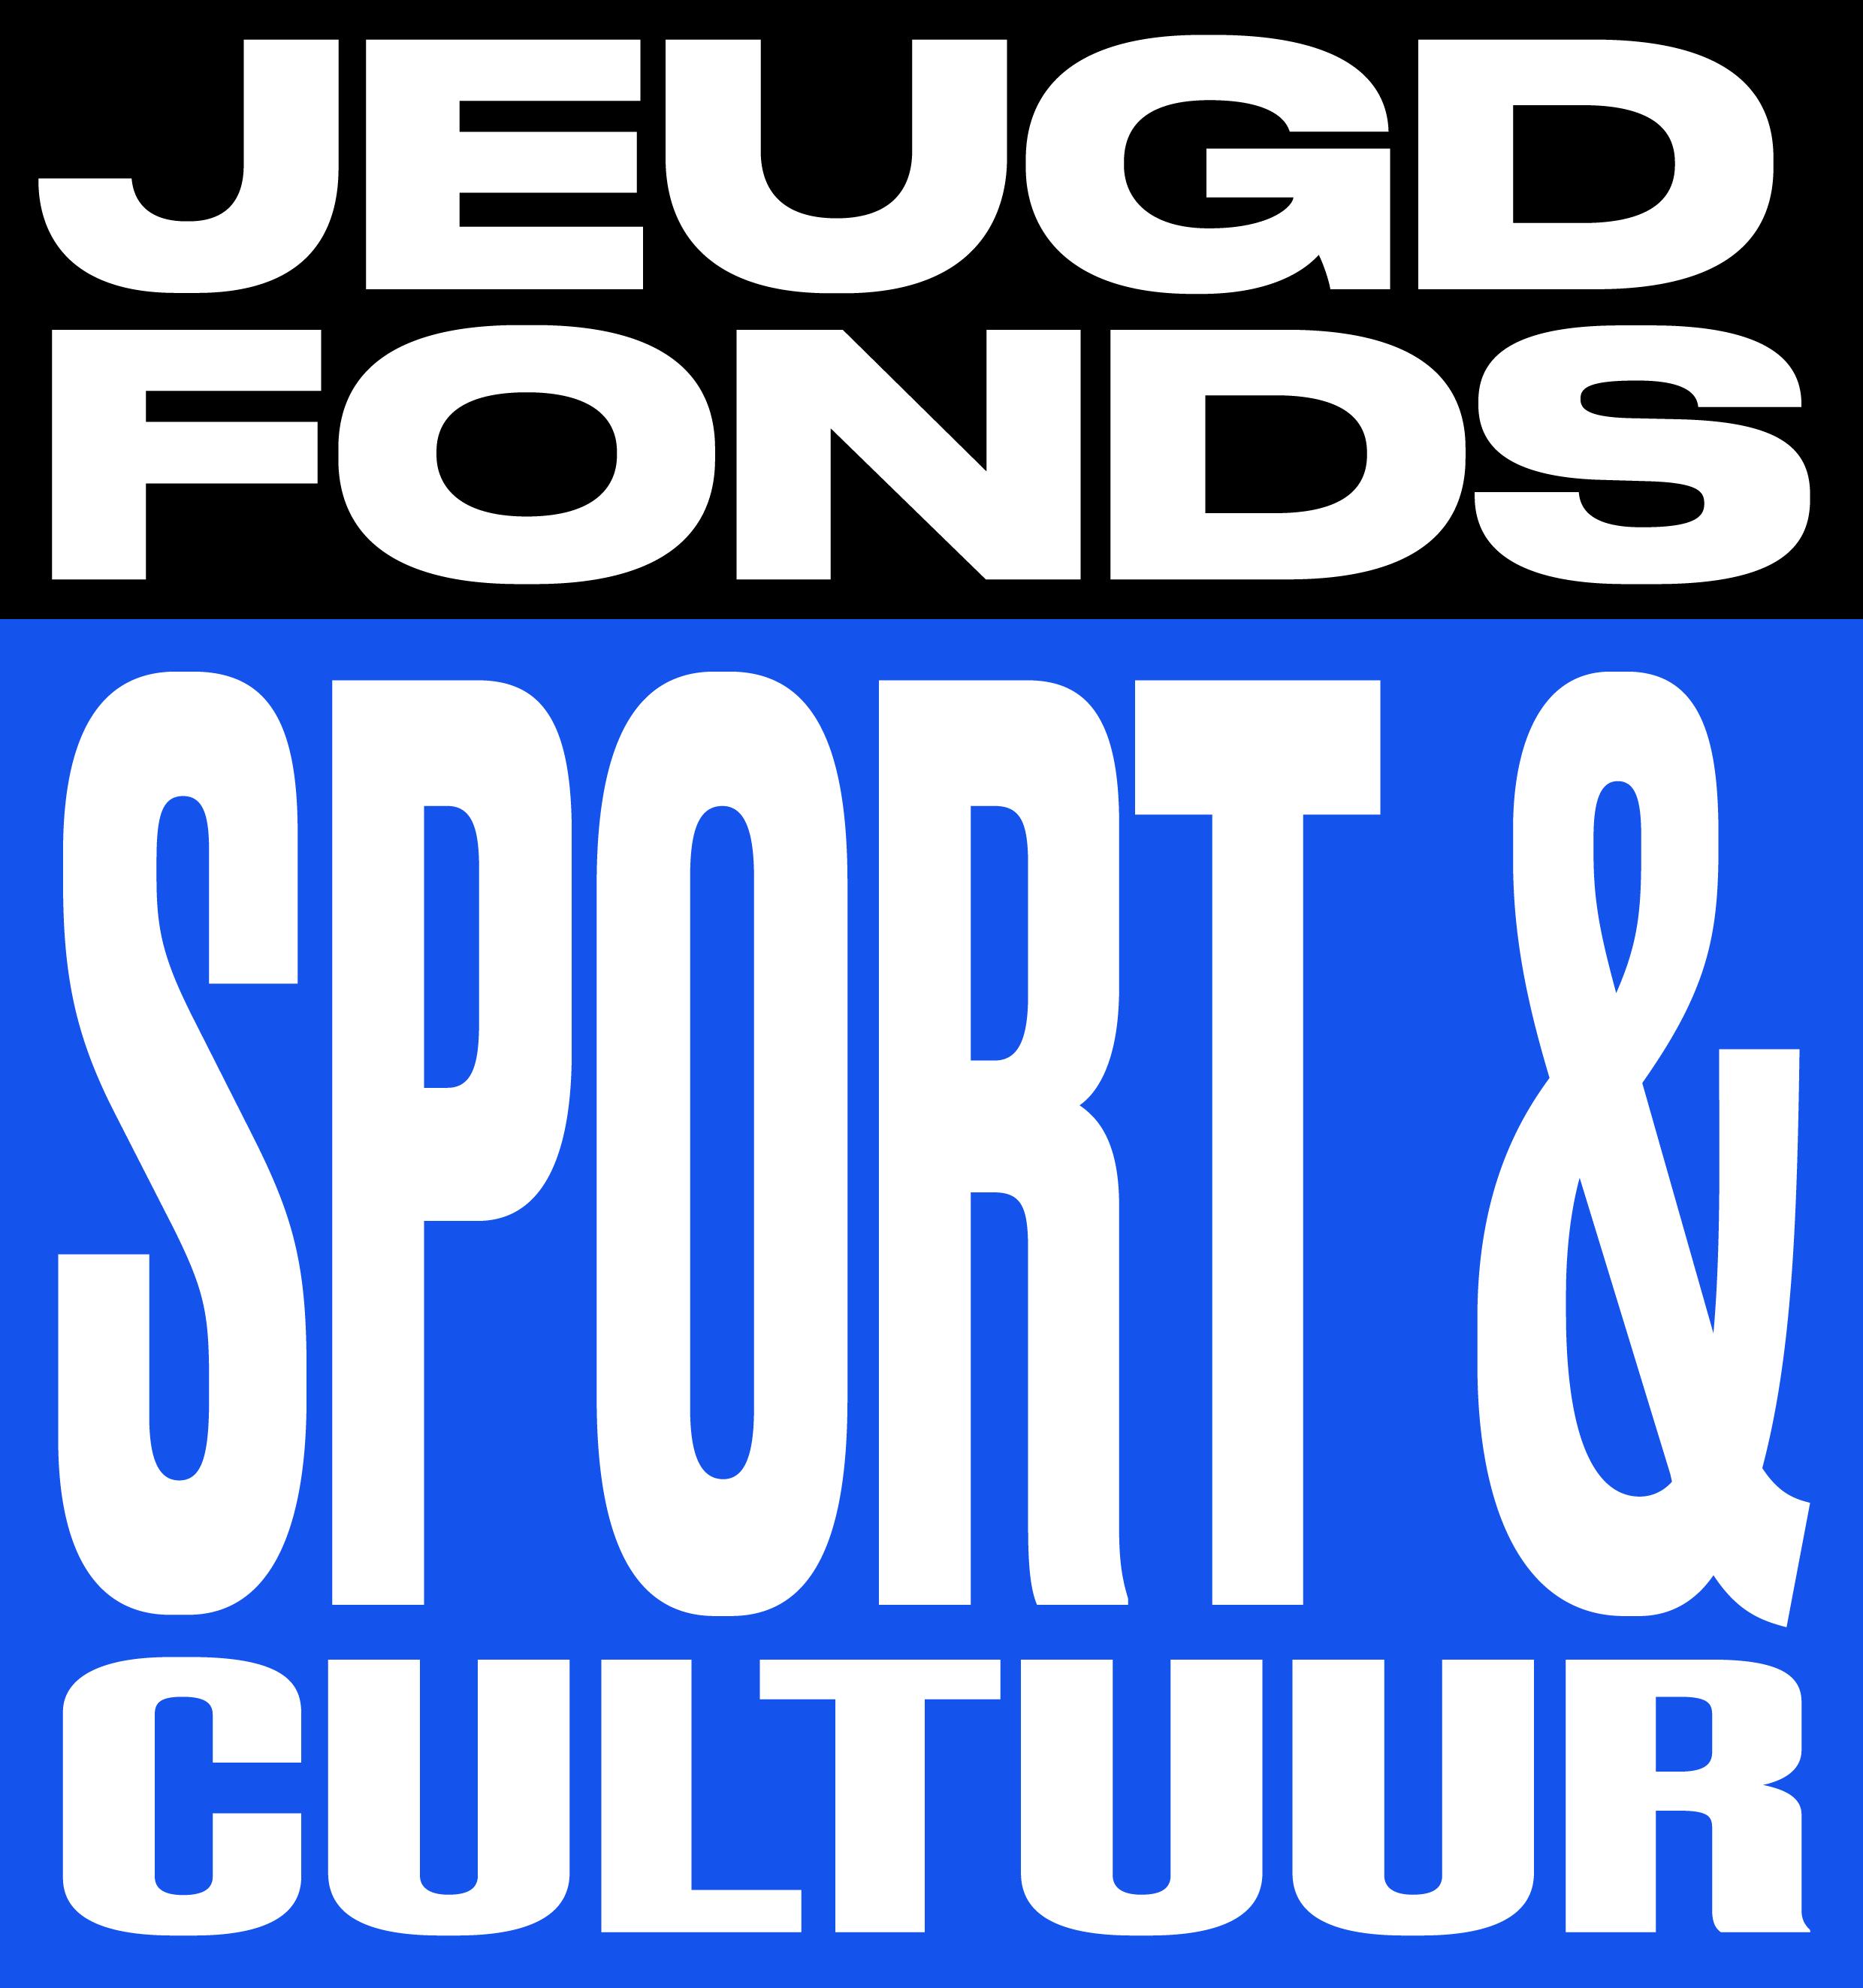 Bericht van Jeugdfonds Sport en Cultuur Drenthe